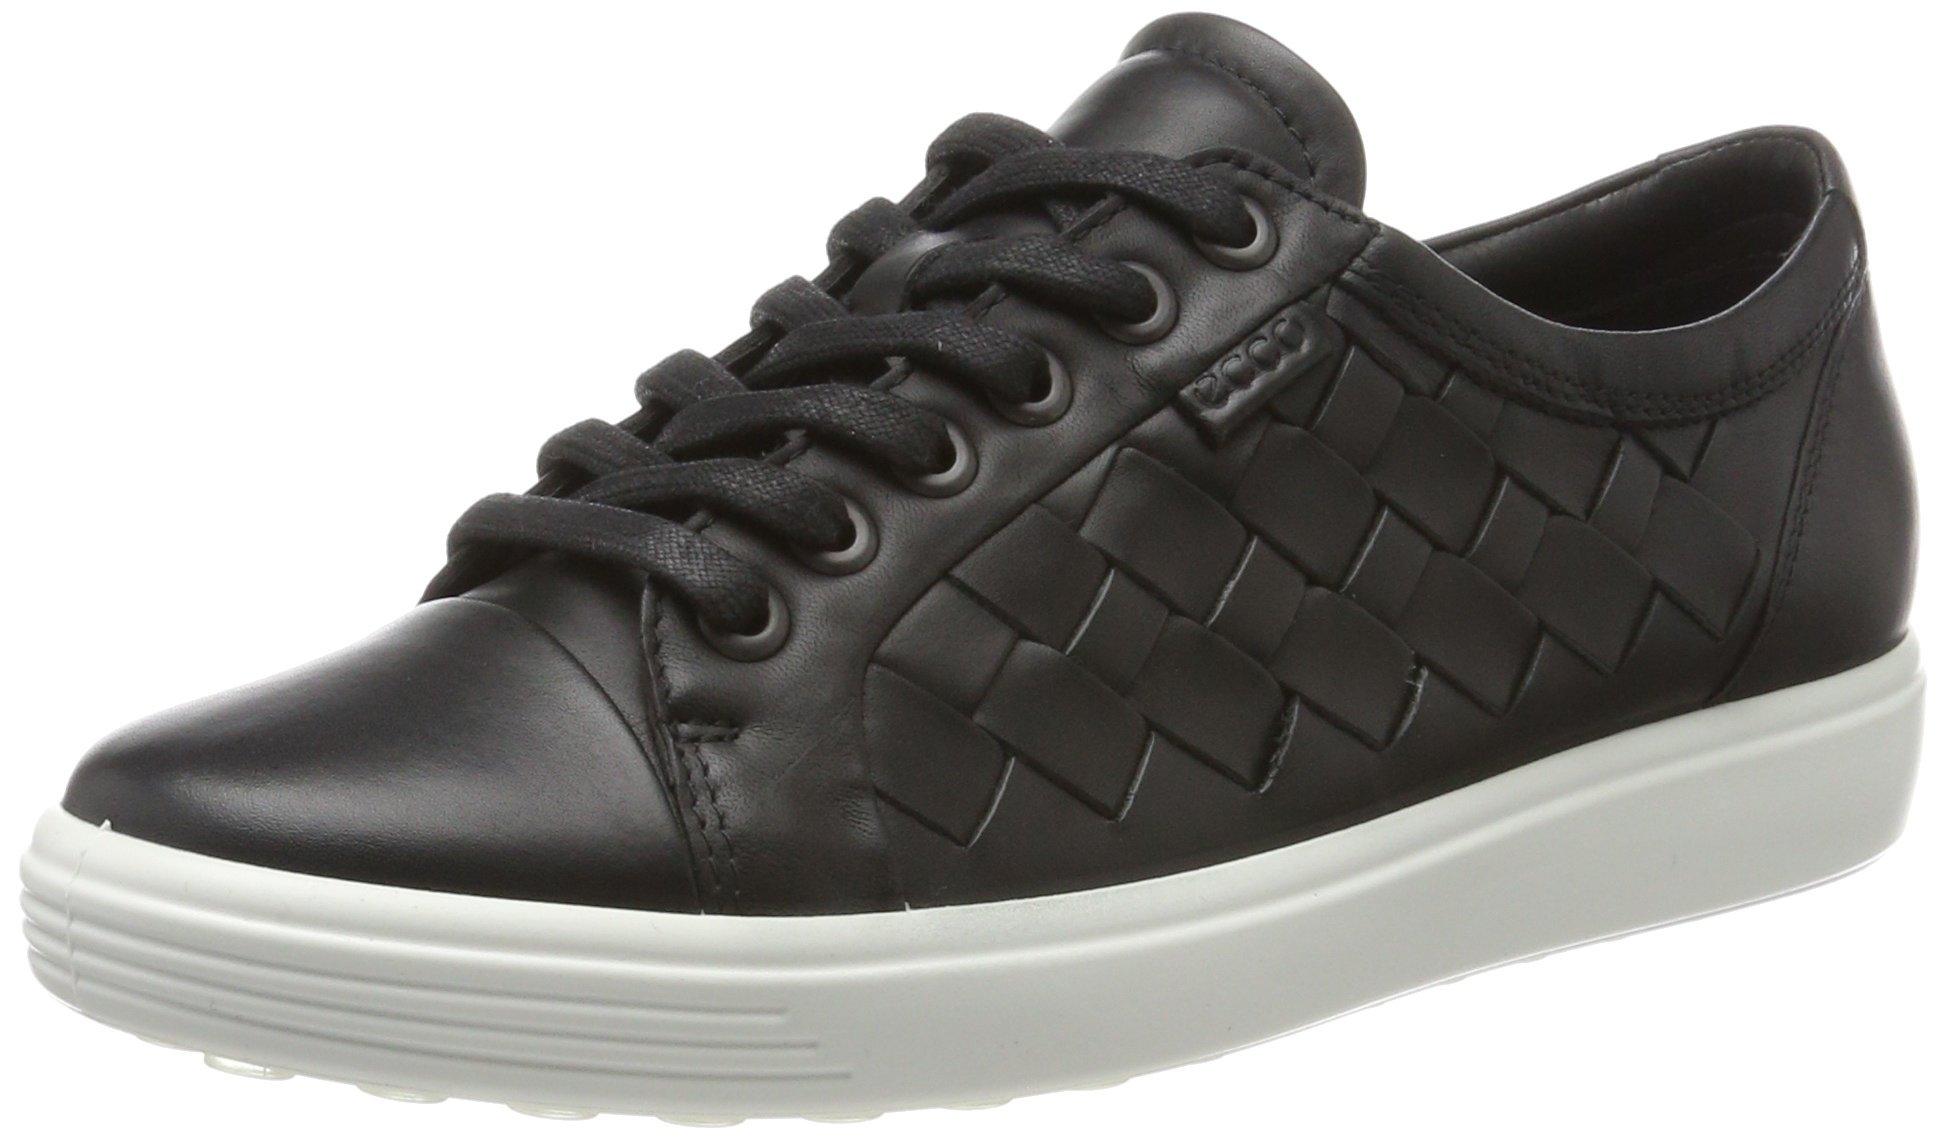 ECCO Women's Women's Soft 7 Woven Tie Fashion Sneaker, Black, 38 EU/7-7.5 M US